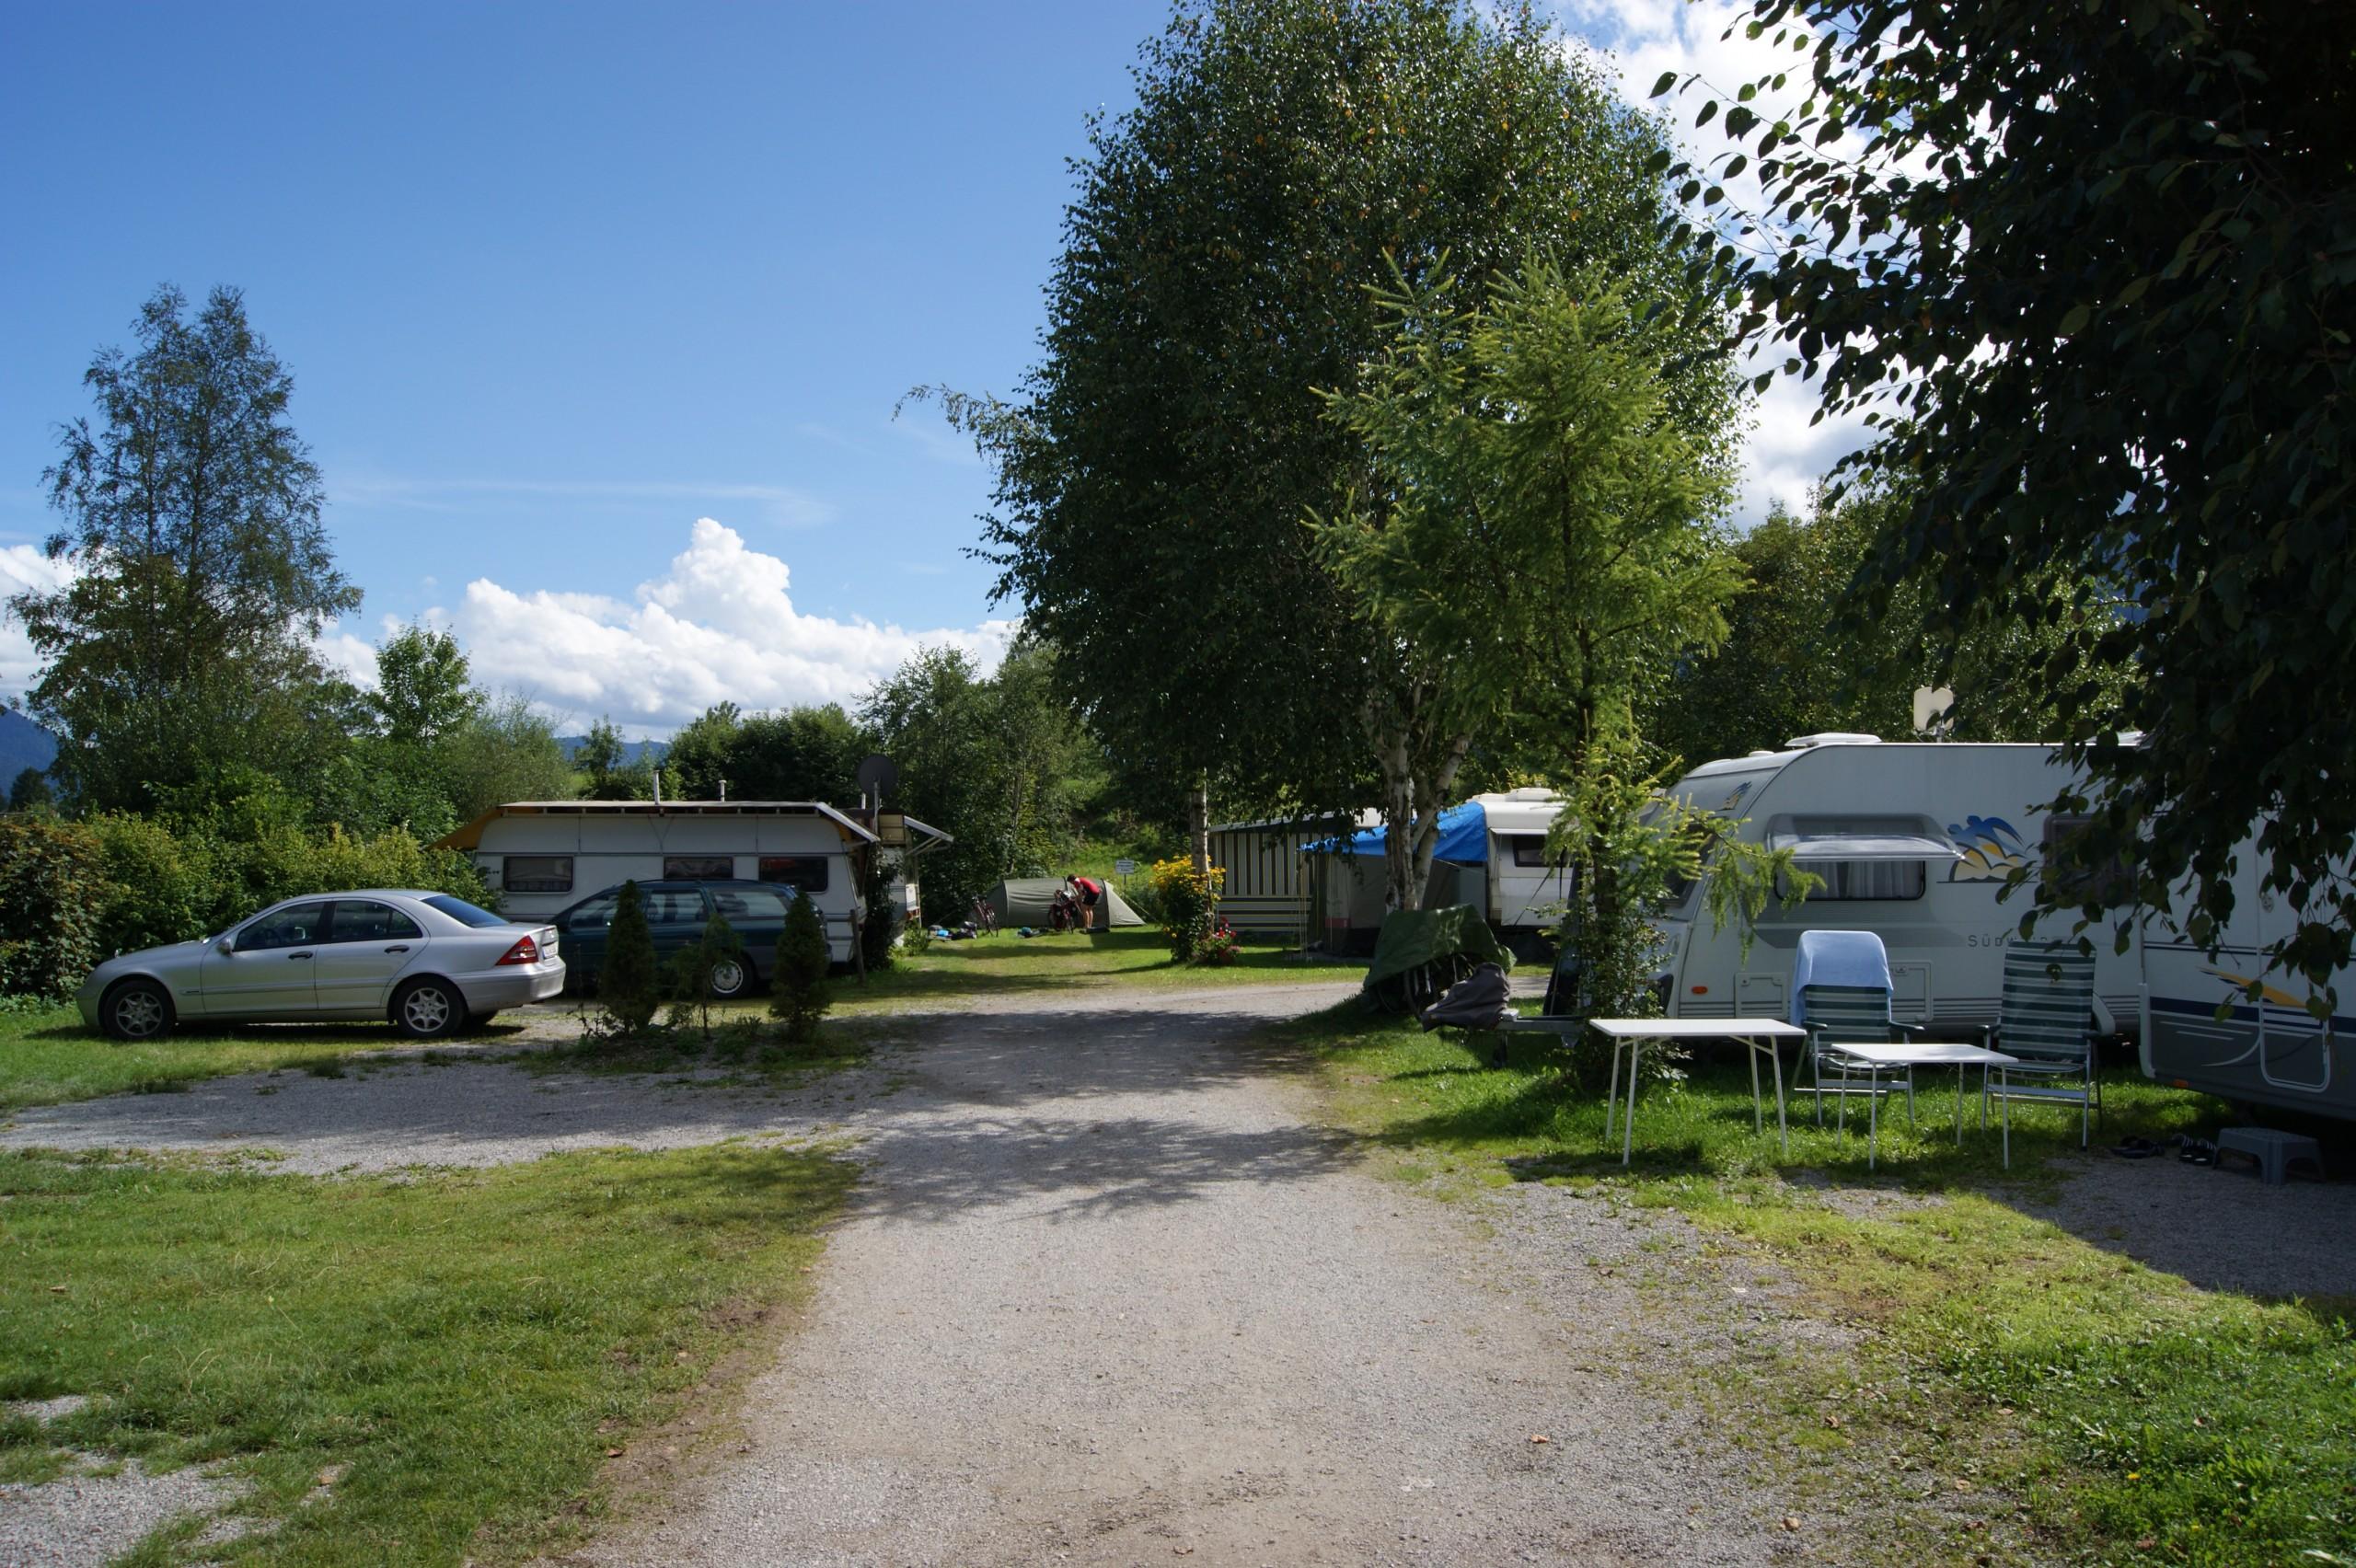 Alpen-Campingplatz Arzbach